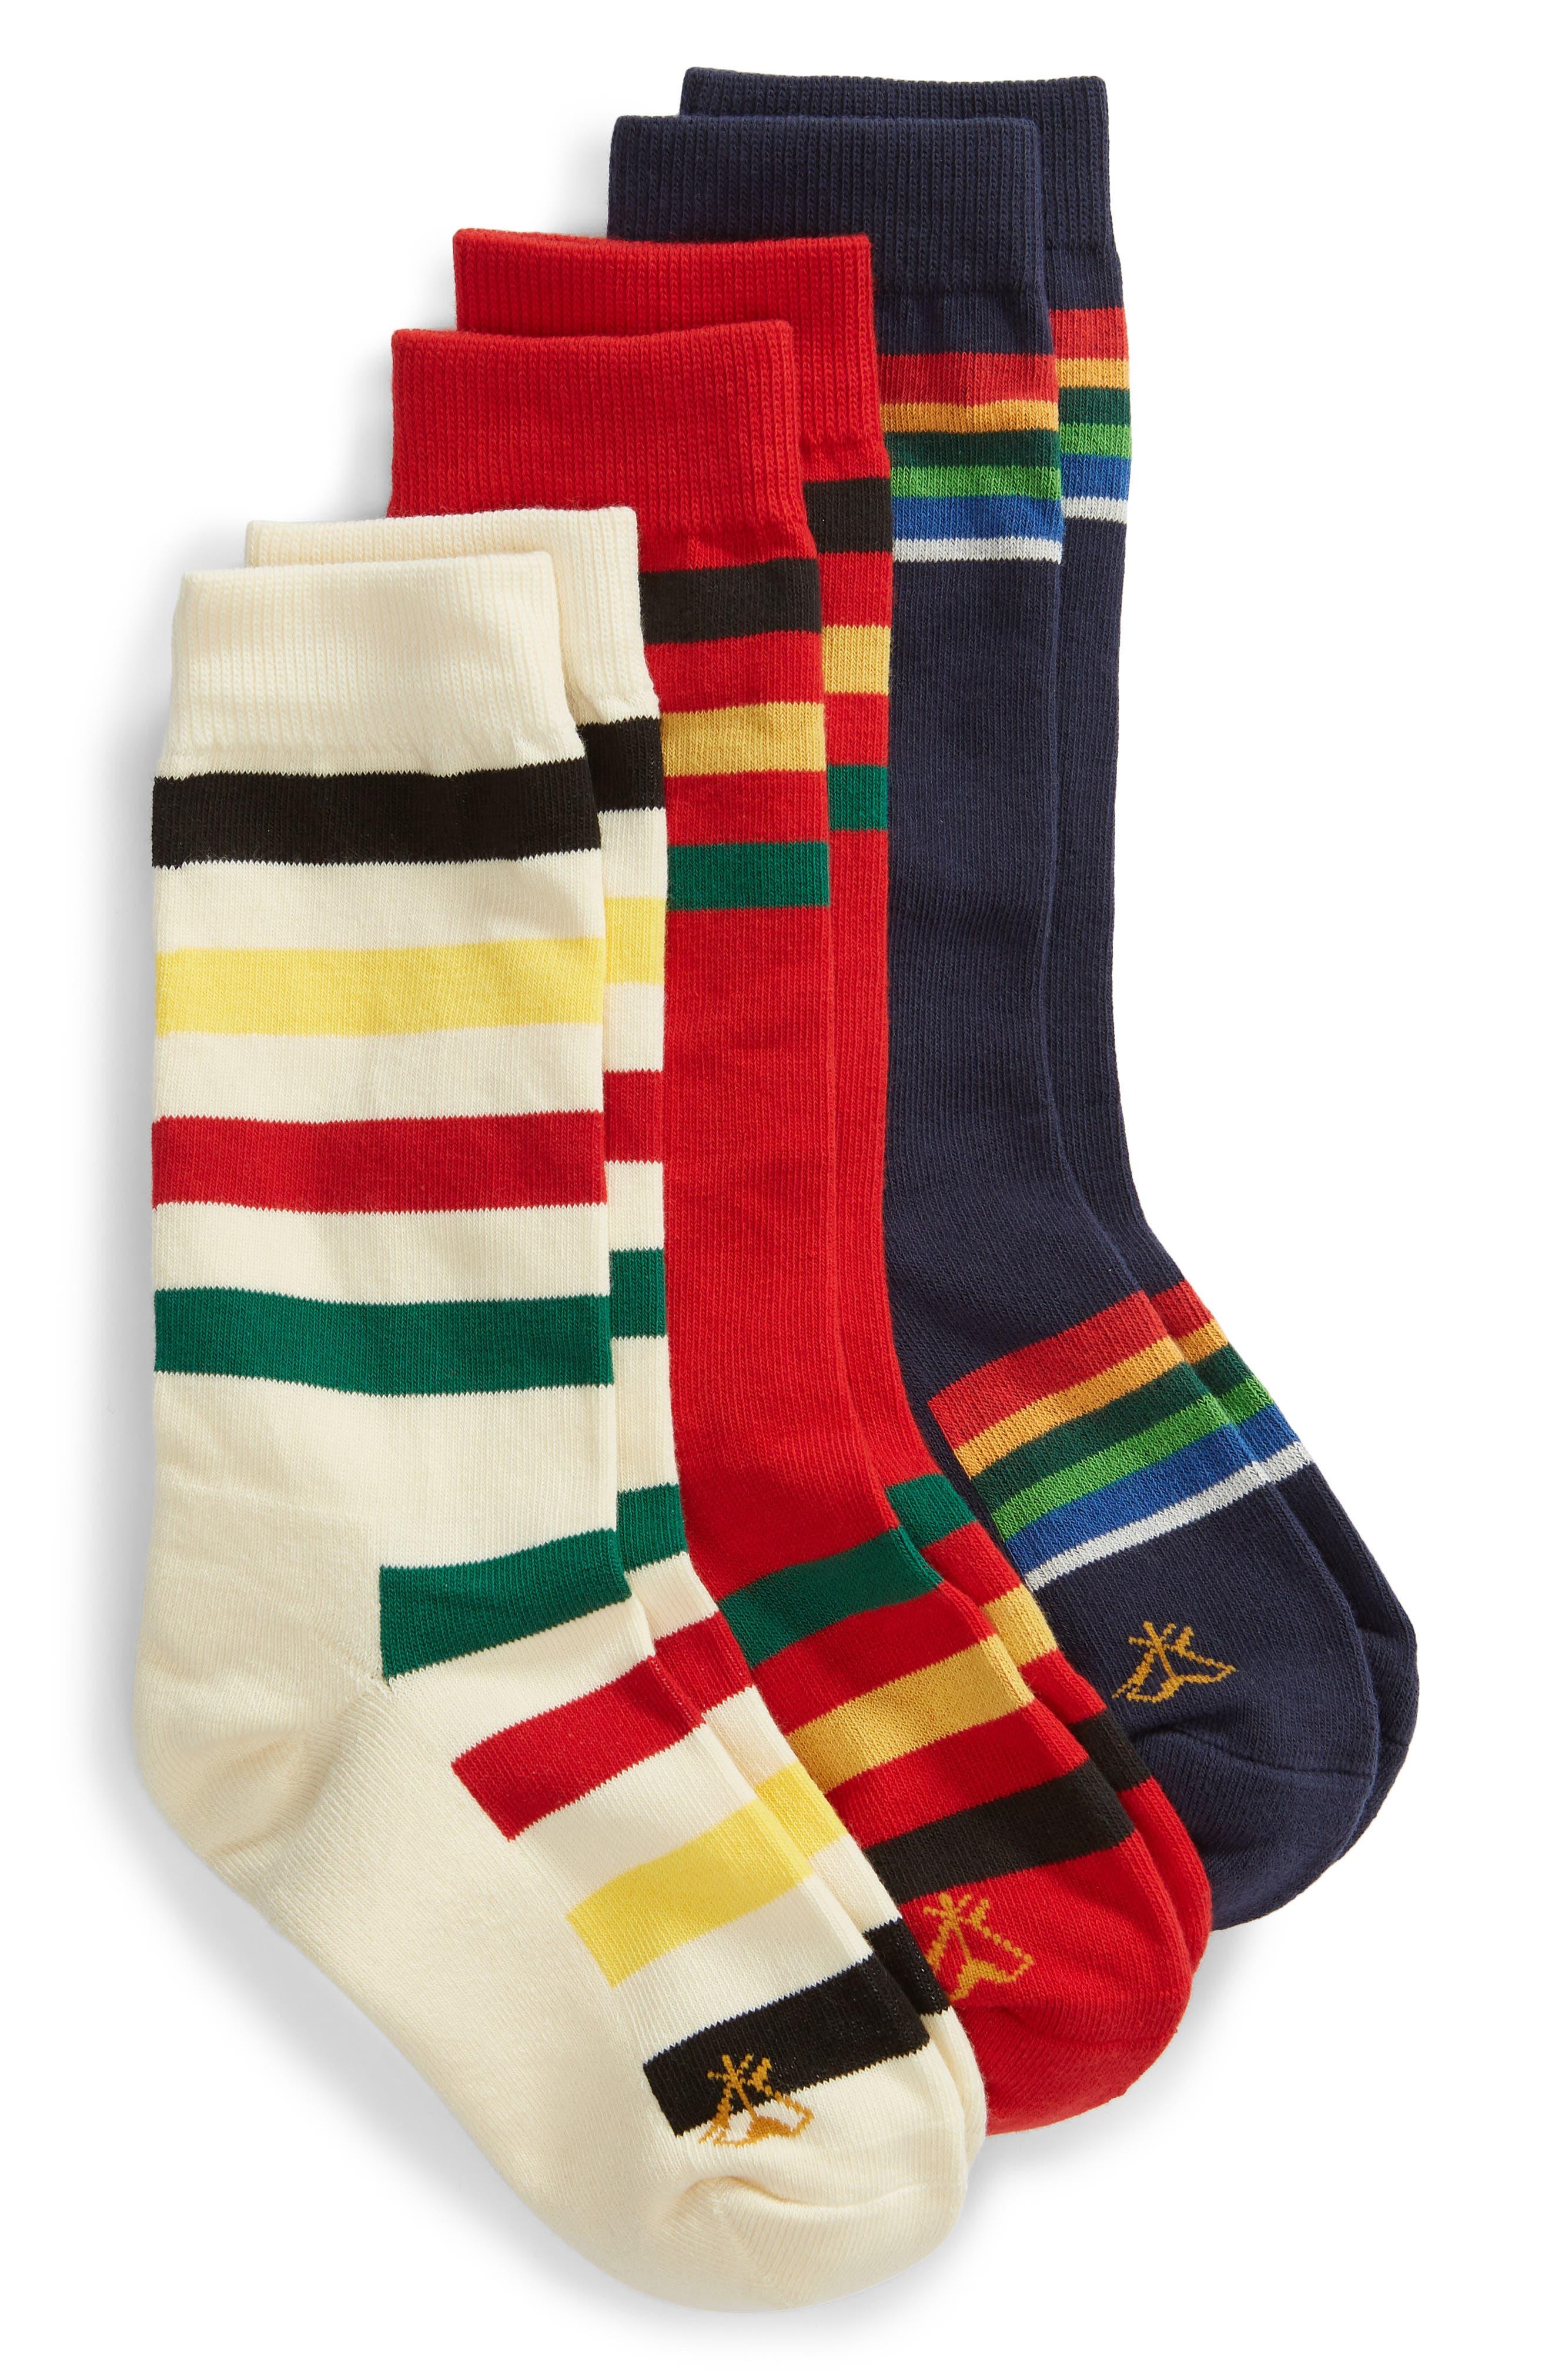 PENDLETON National Park 3-Pack Crew Socks in Assorted Bright